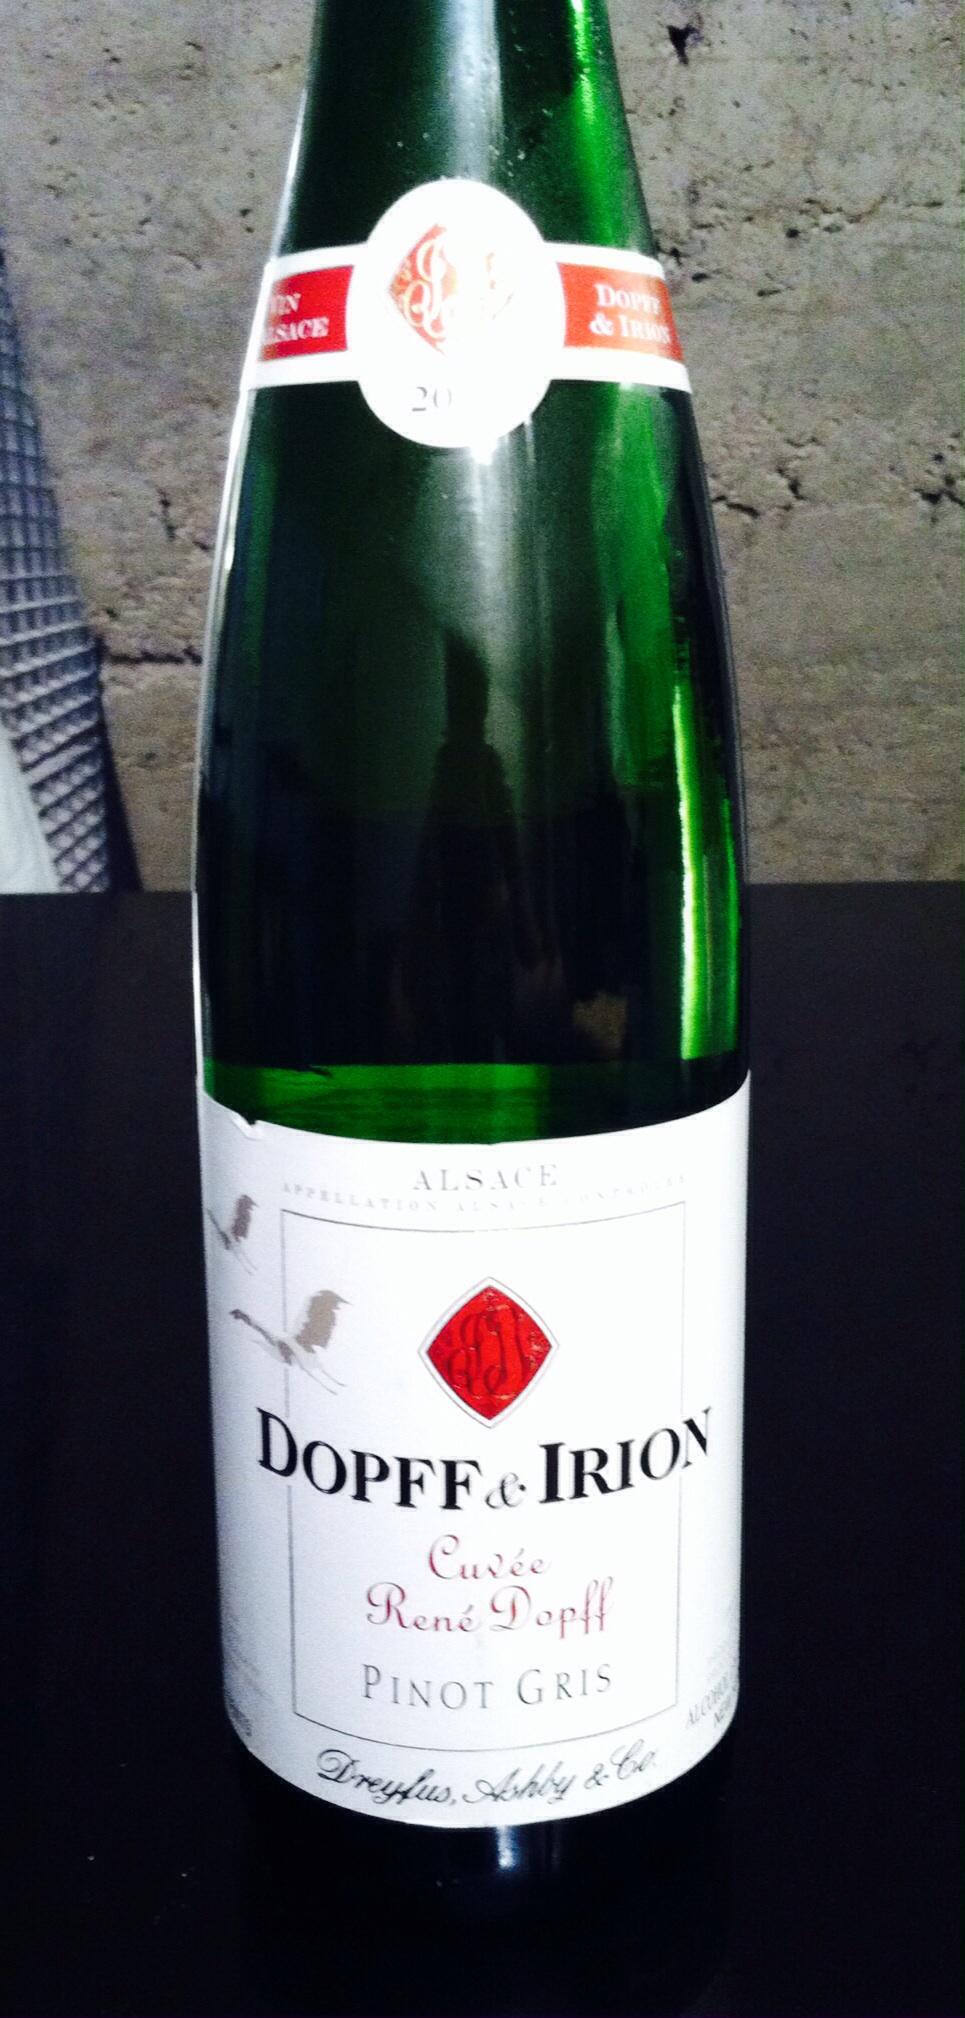 Dopff & Irion Cuvee, Pinot Gris, Alsace, 2012. Photo by Shana Sokol, Shana Speaks Wine.